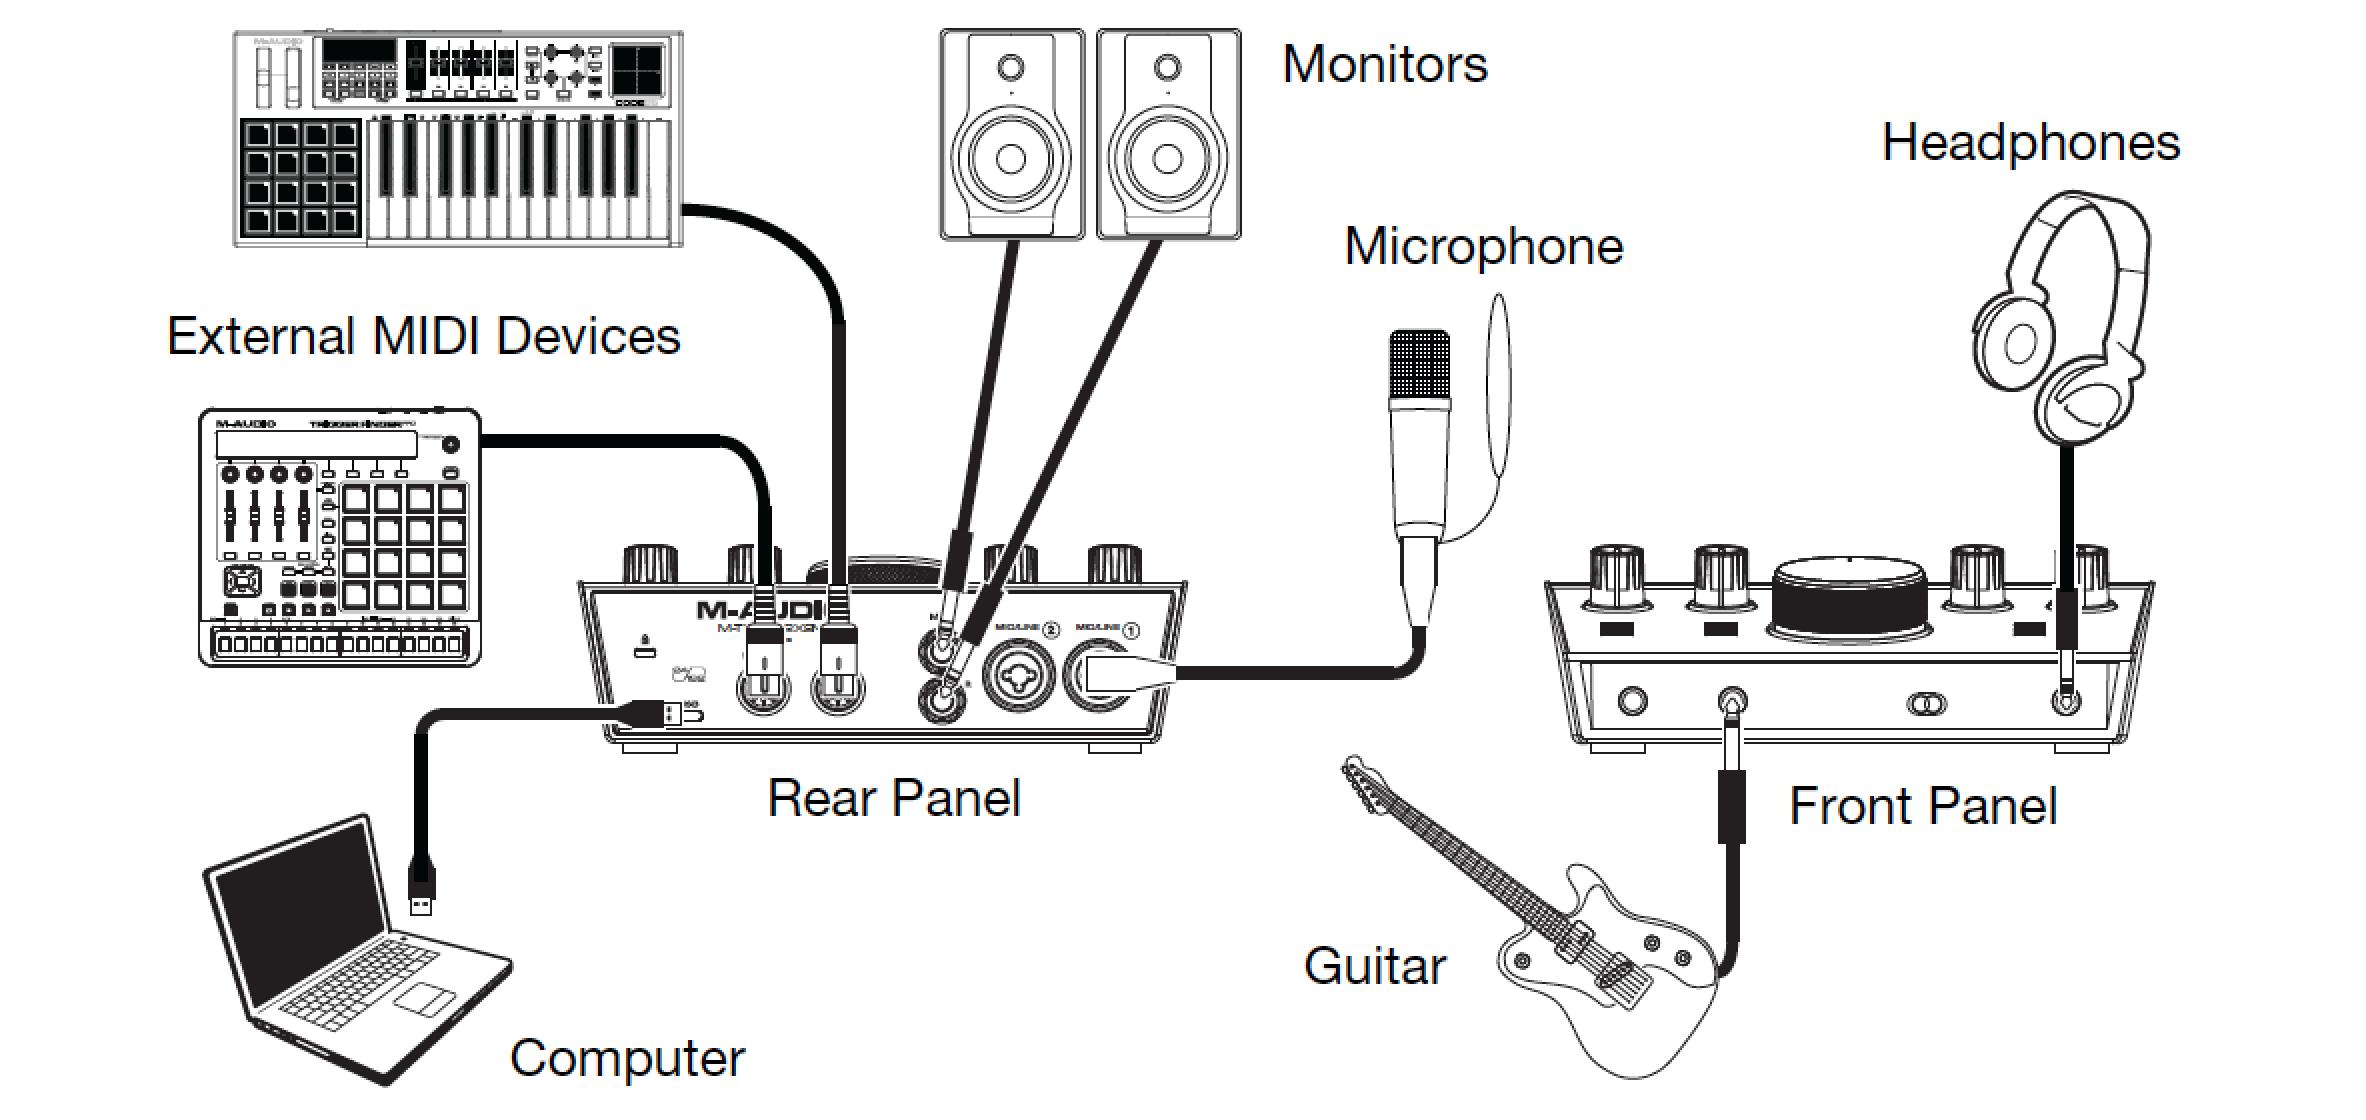 M-AUDIO M-TRACK 2x2M INTERFACCIA AUDIO USB MIDI 2 IN 2 OUT 24BIT 192KHz 2